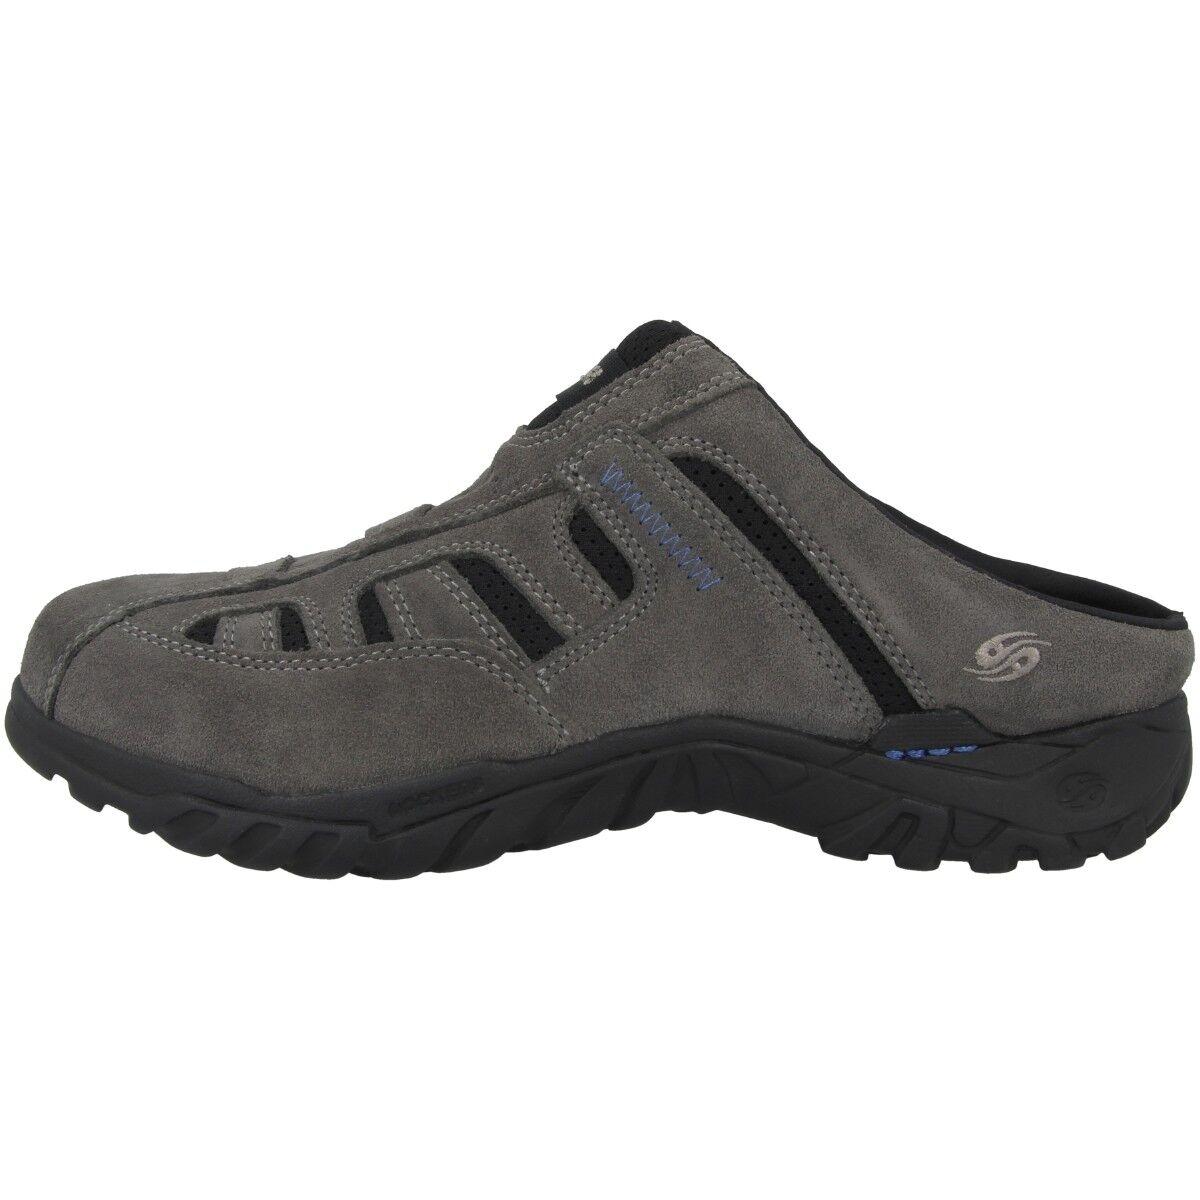 Dockers Dockers Dockers By Gerli 36LI005 shoes Homme Sandales Mules Sabots 36LI005-200236 d087d9